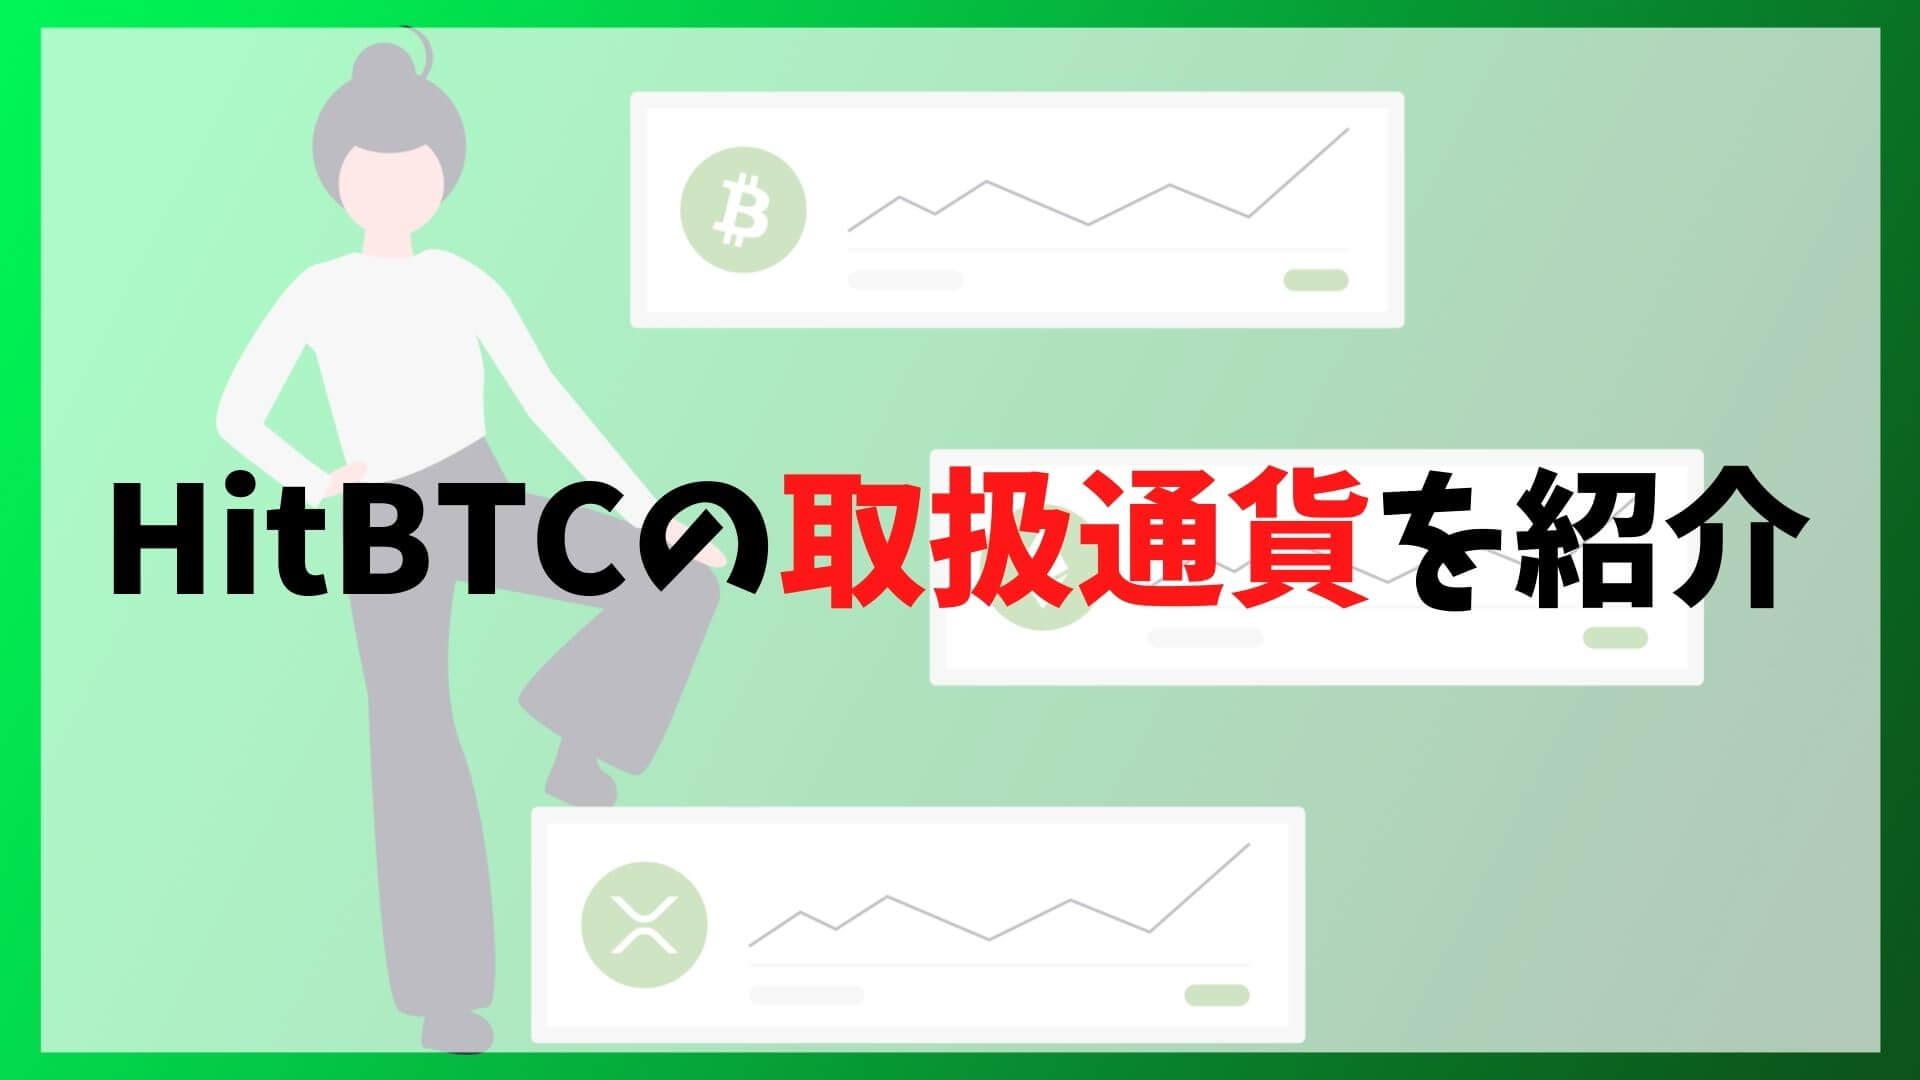 HitBTC(ヒットビ-ティーシー)の取扱通貨